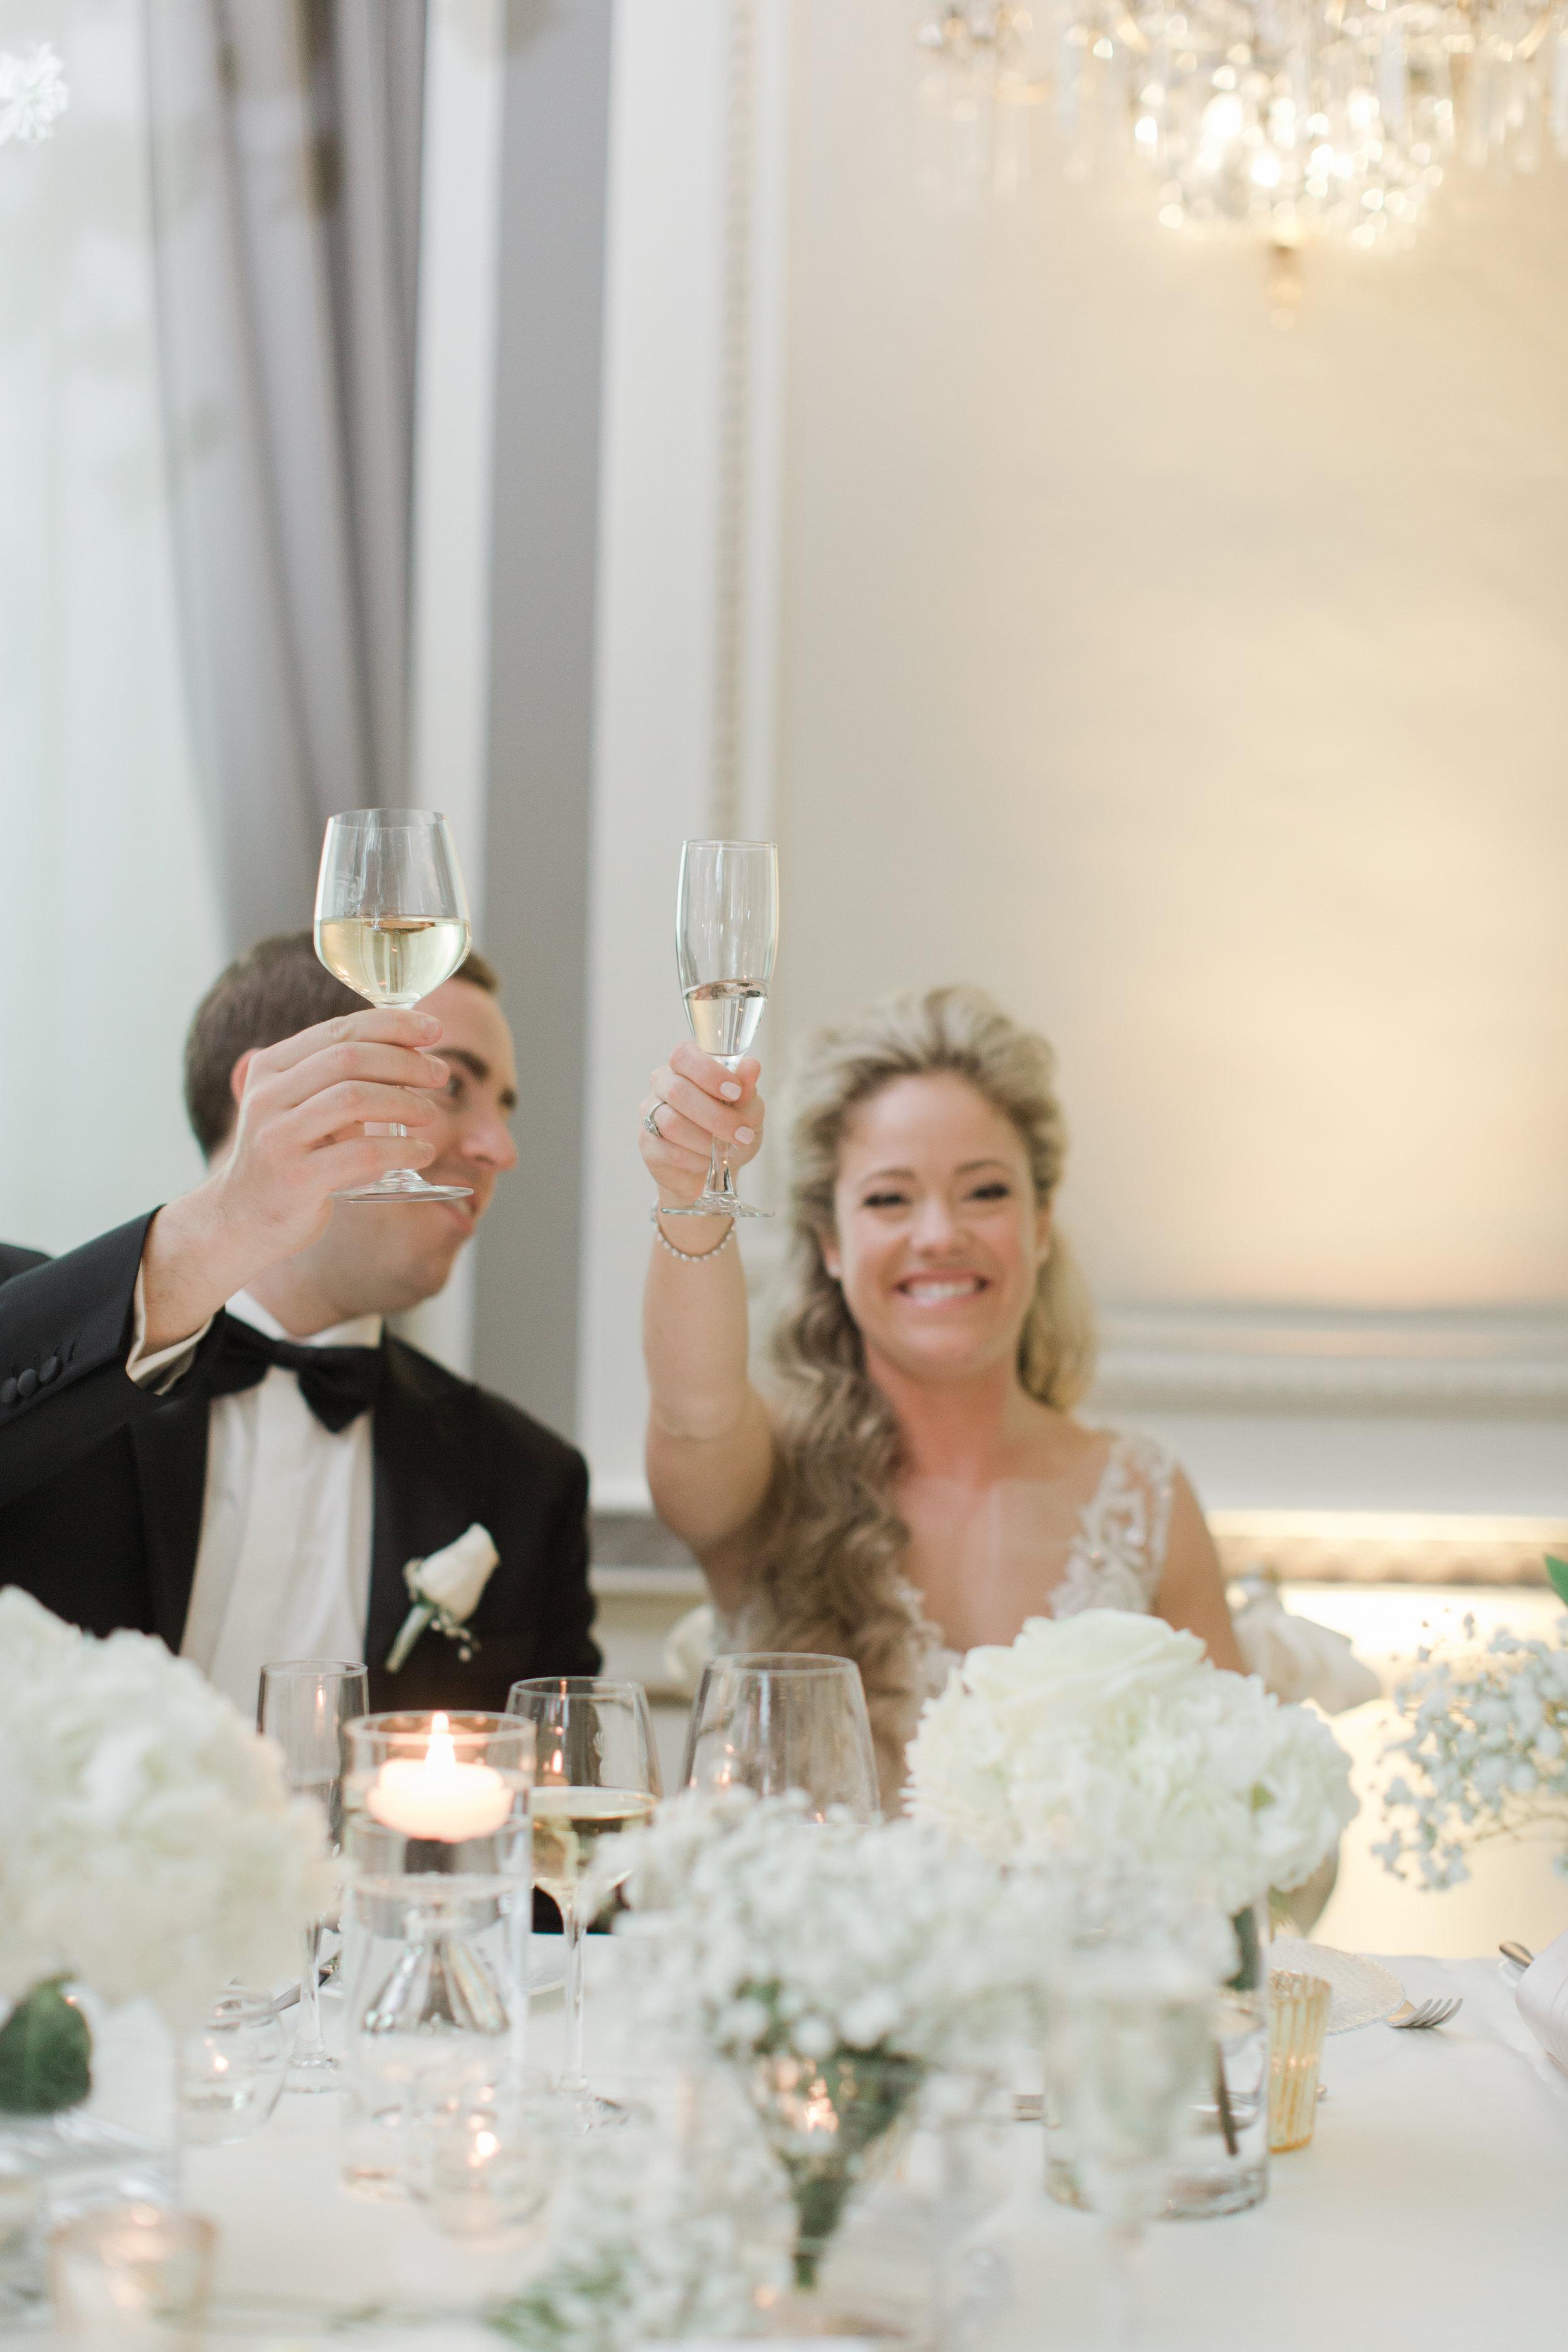 chateau-frontenac-quebec-city-best-toronto-wedding-photographer-soft-bright-pastel-richelle-hunter-elliott-heidi-902.jpg